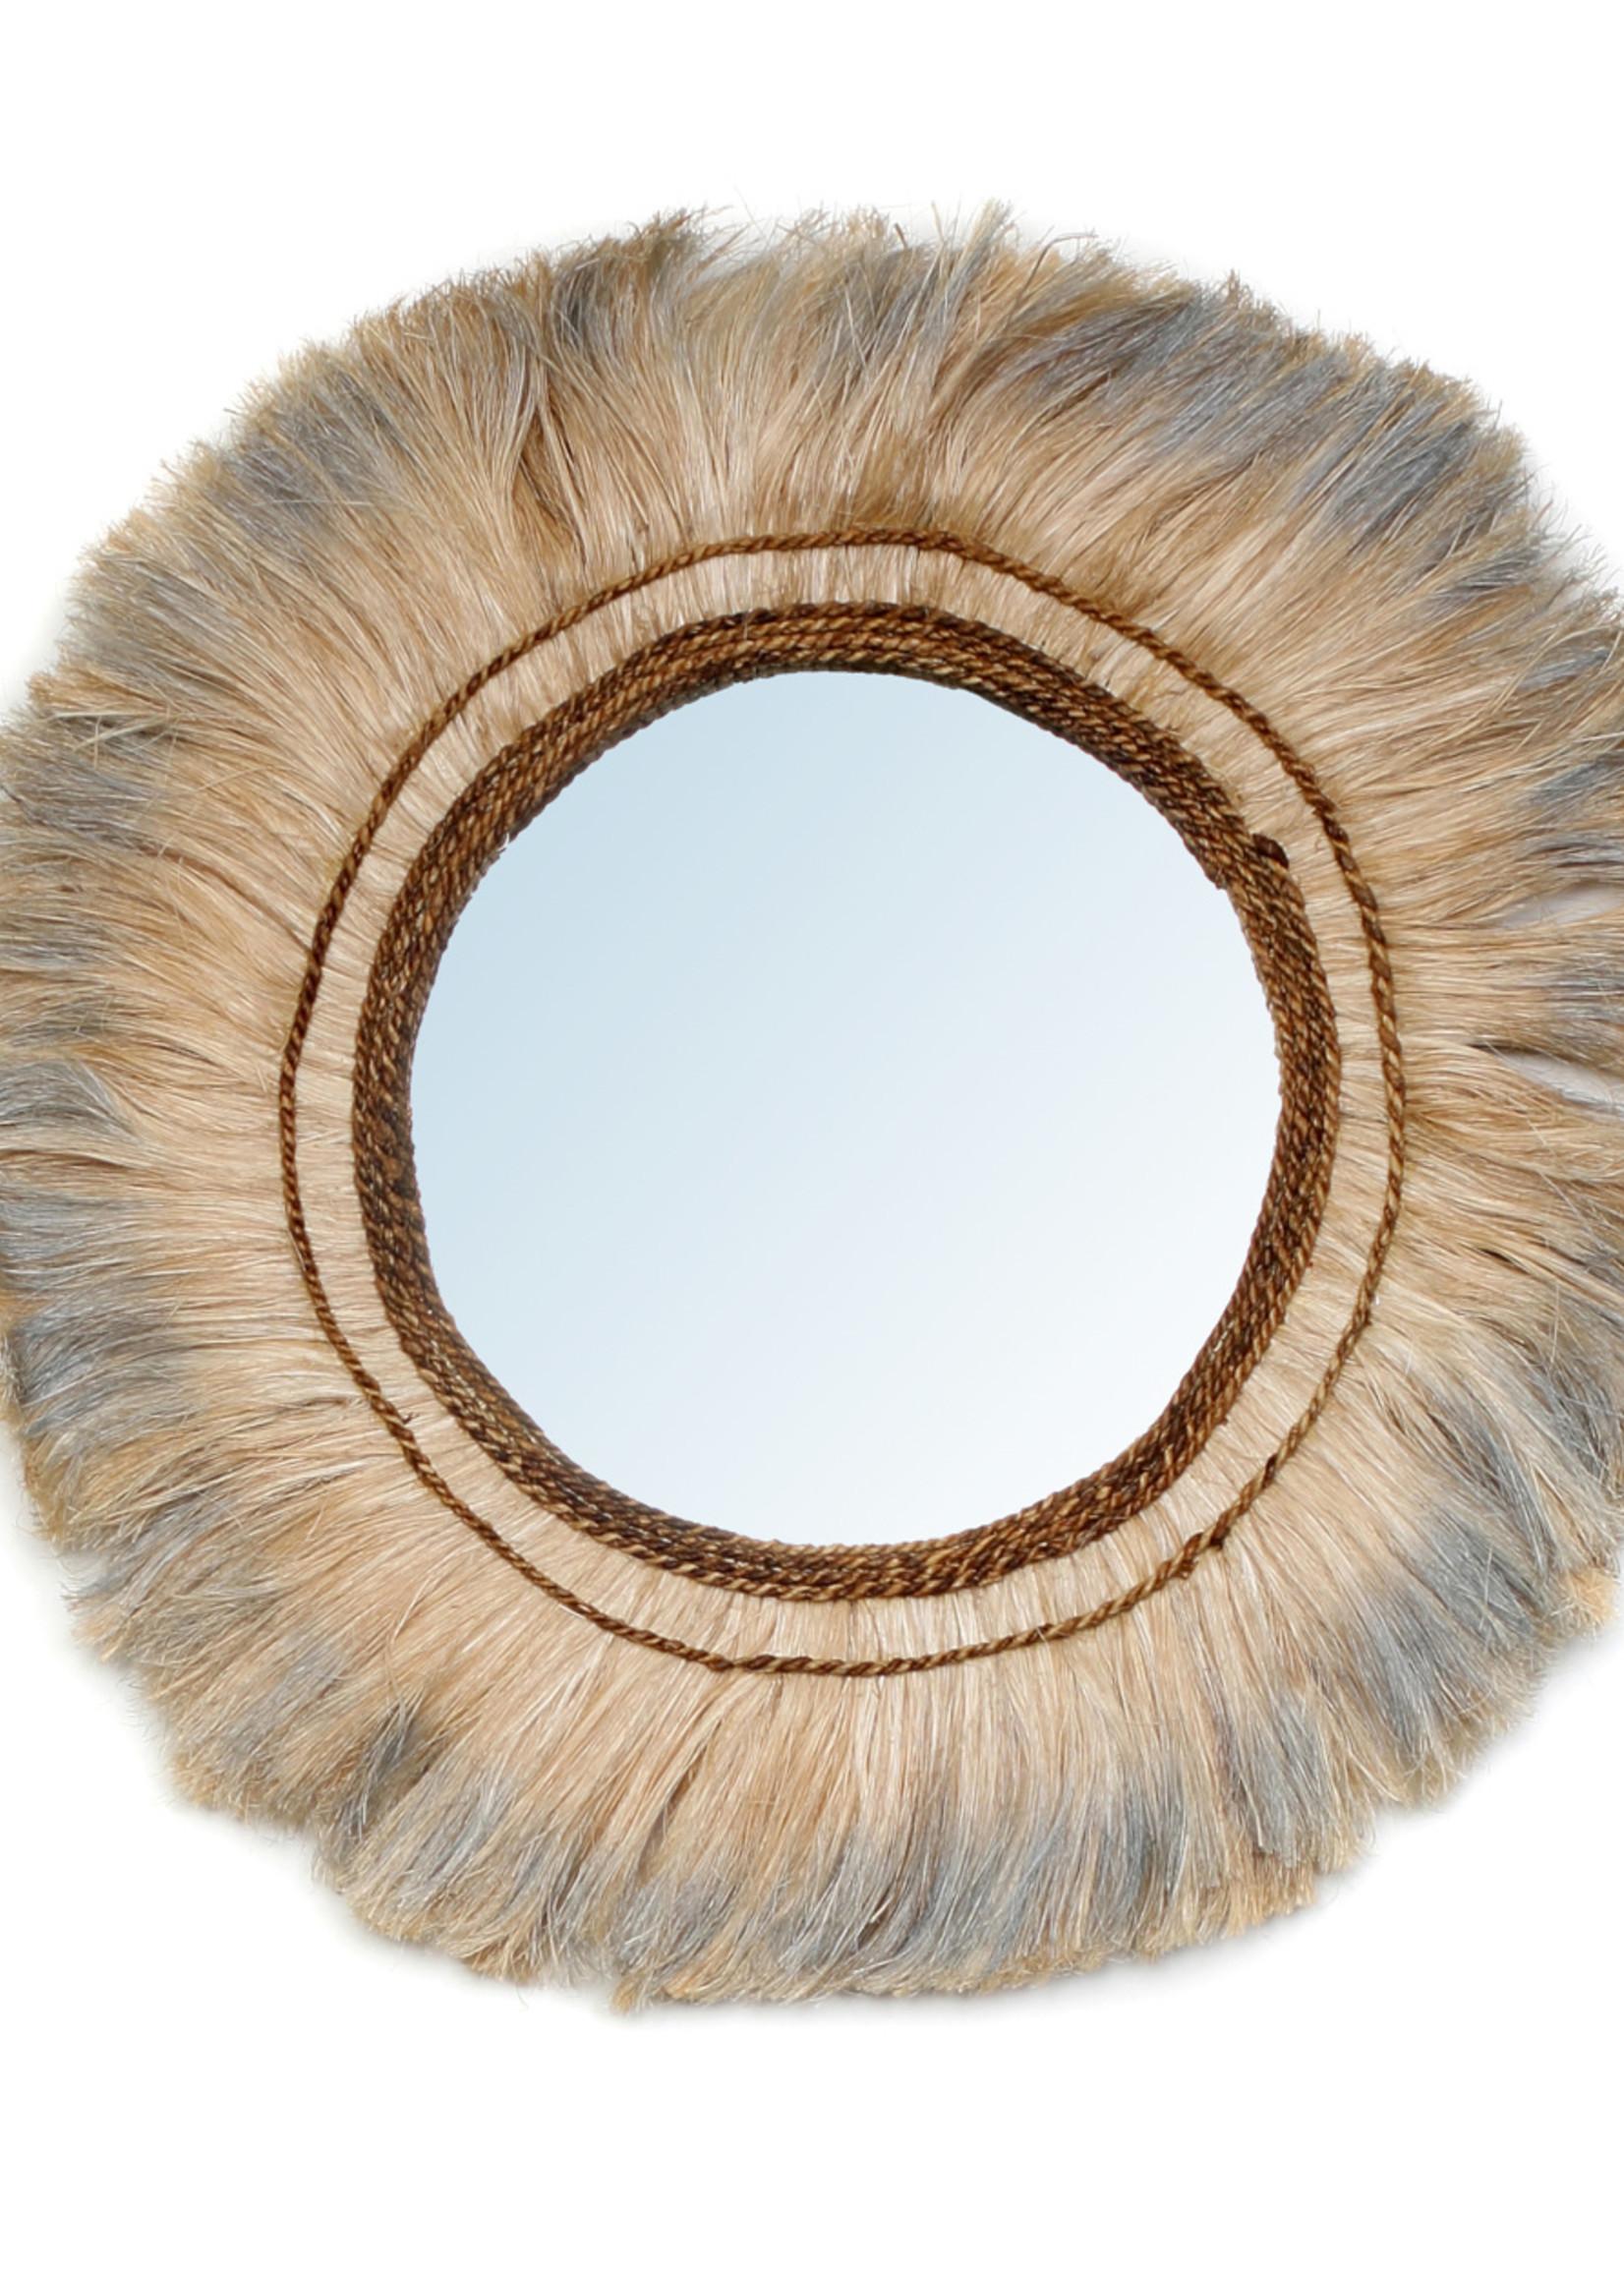 The Baloo Mirror - Natural Silver - L